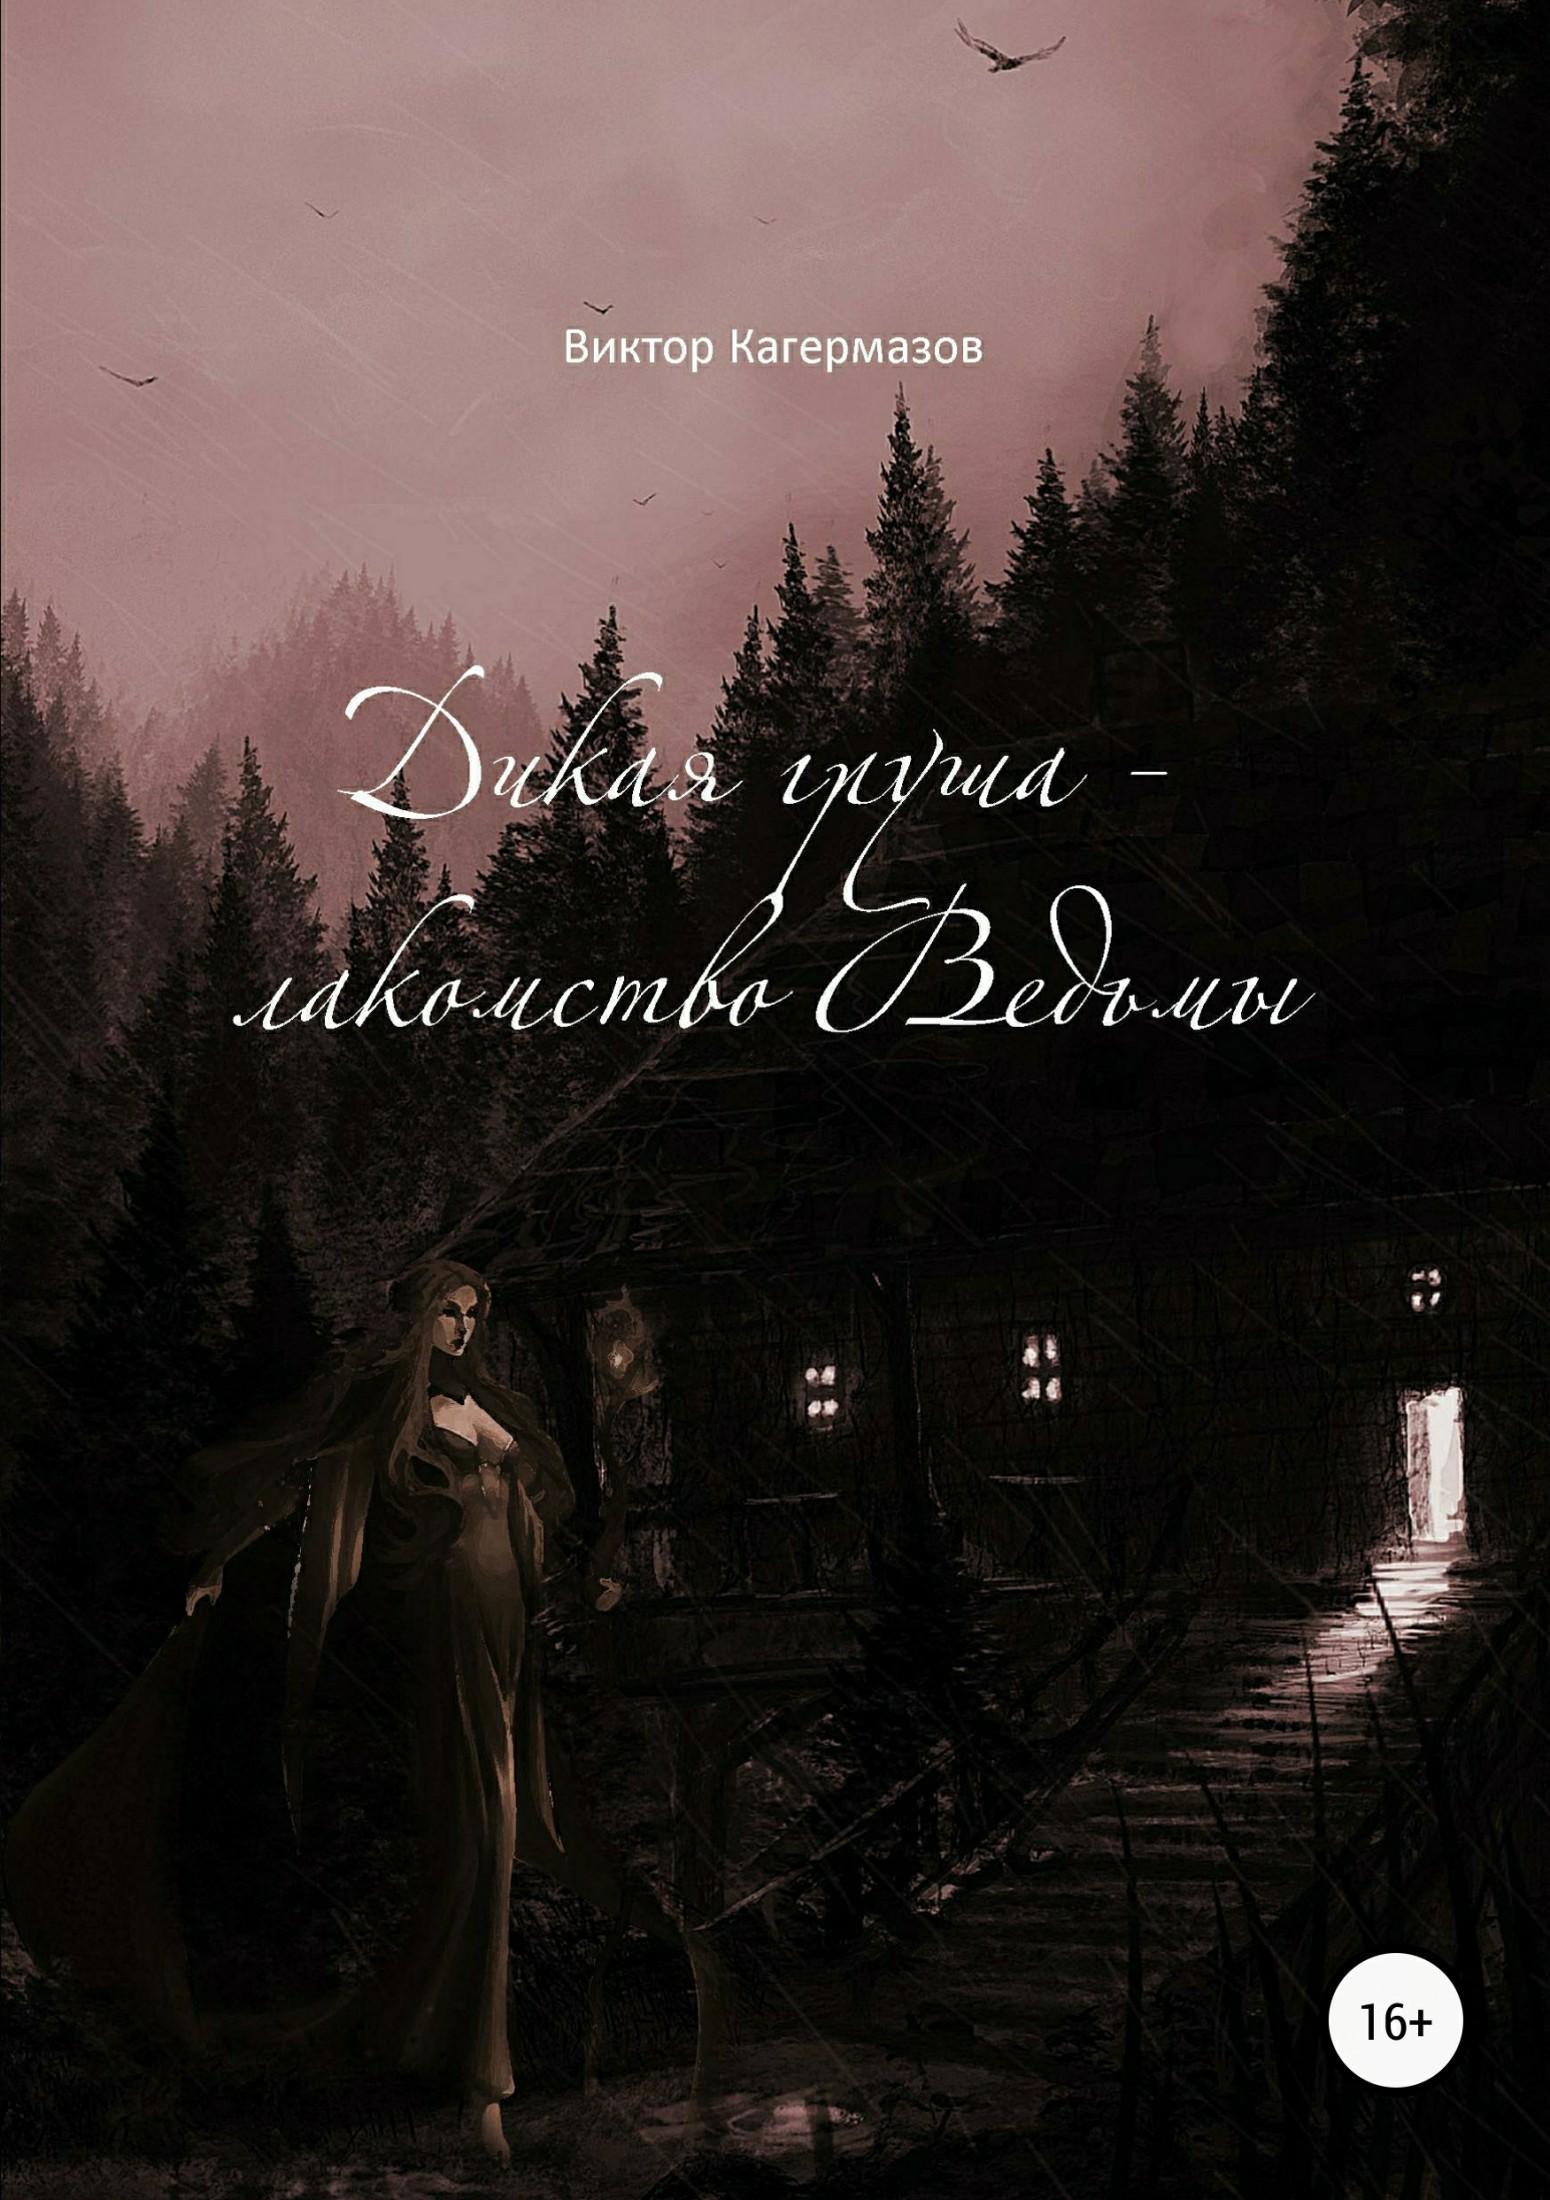 Виктор Каирбекович Кагермазов бесплатно